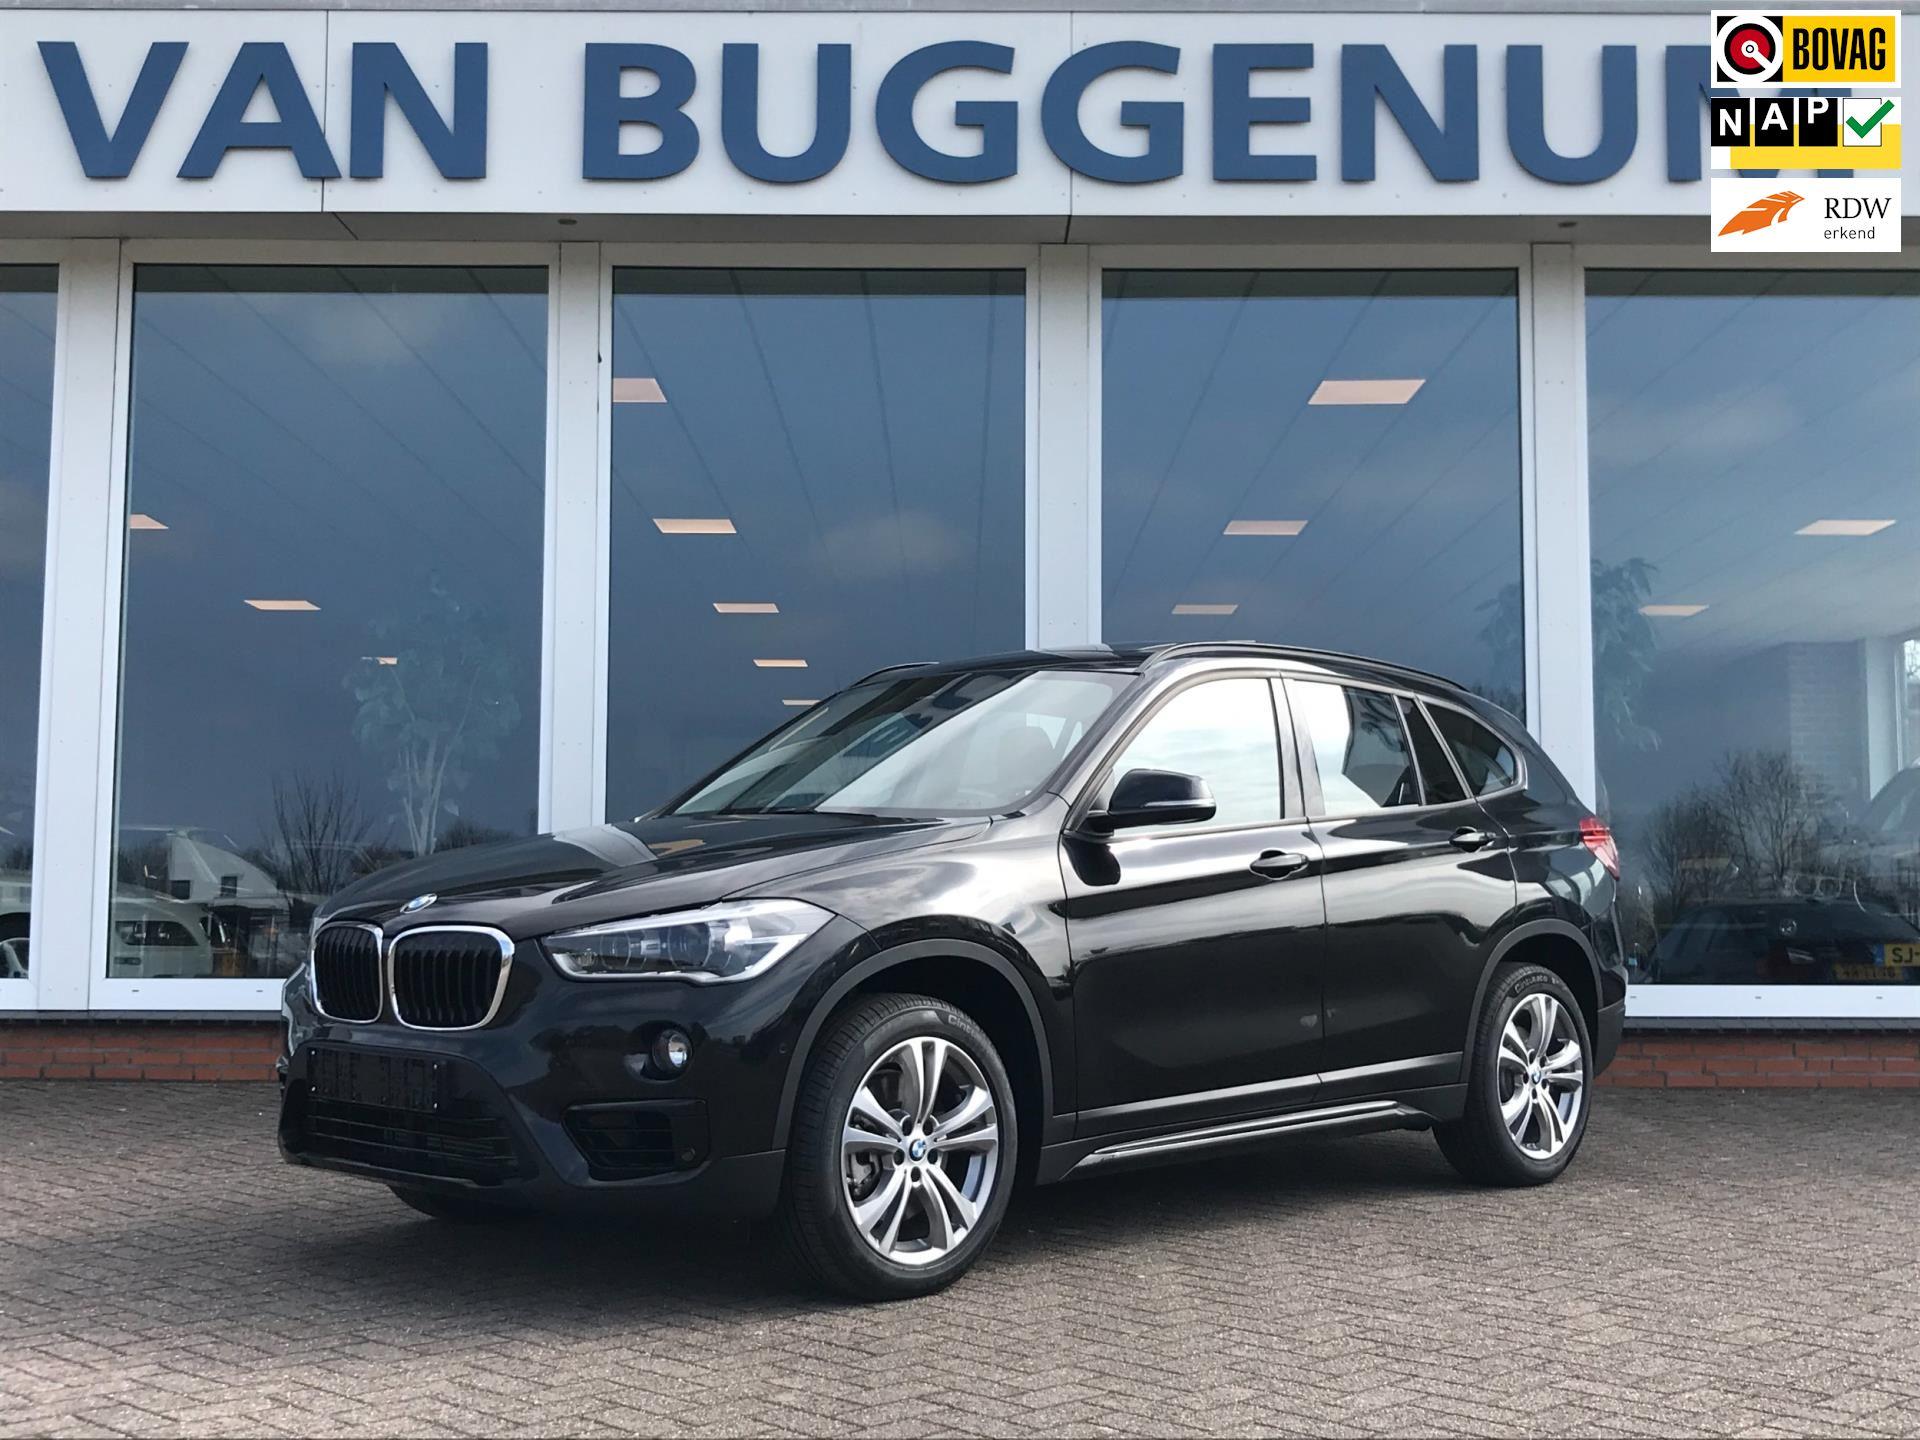 BMW X1 occasion - Automobielbedrijf J. van Buggenum